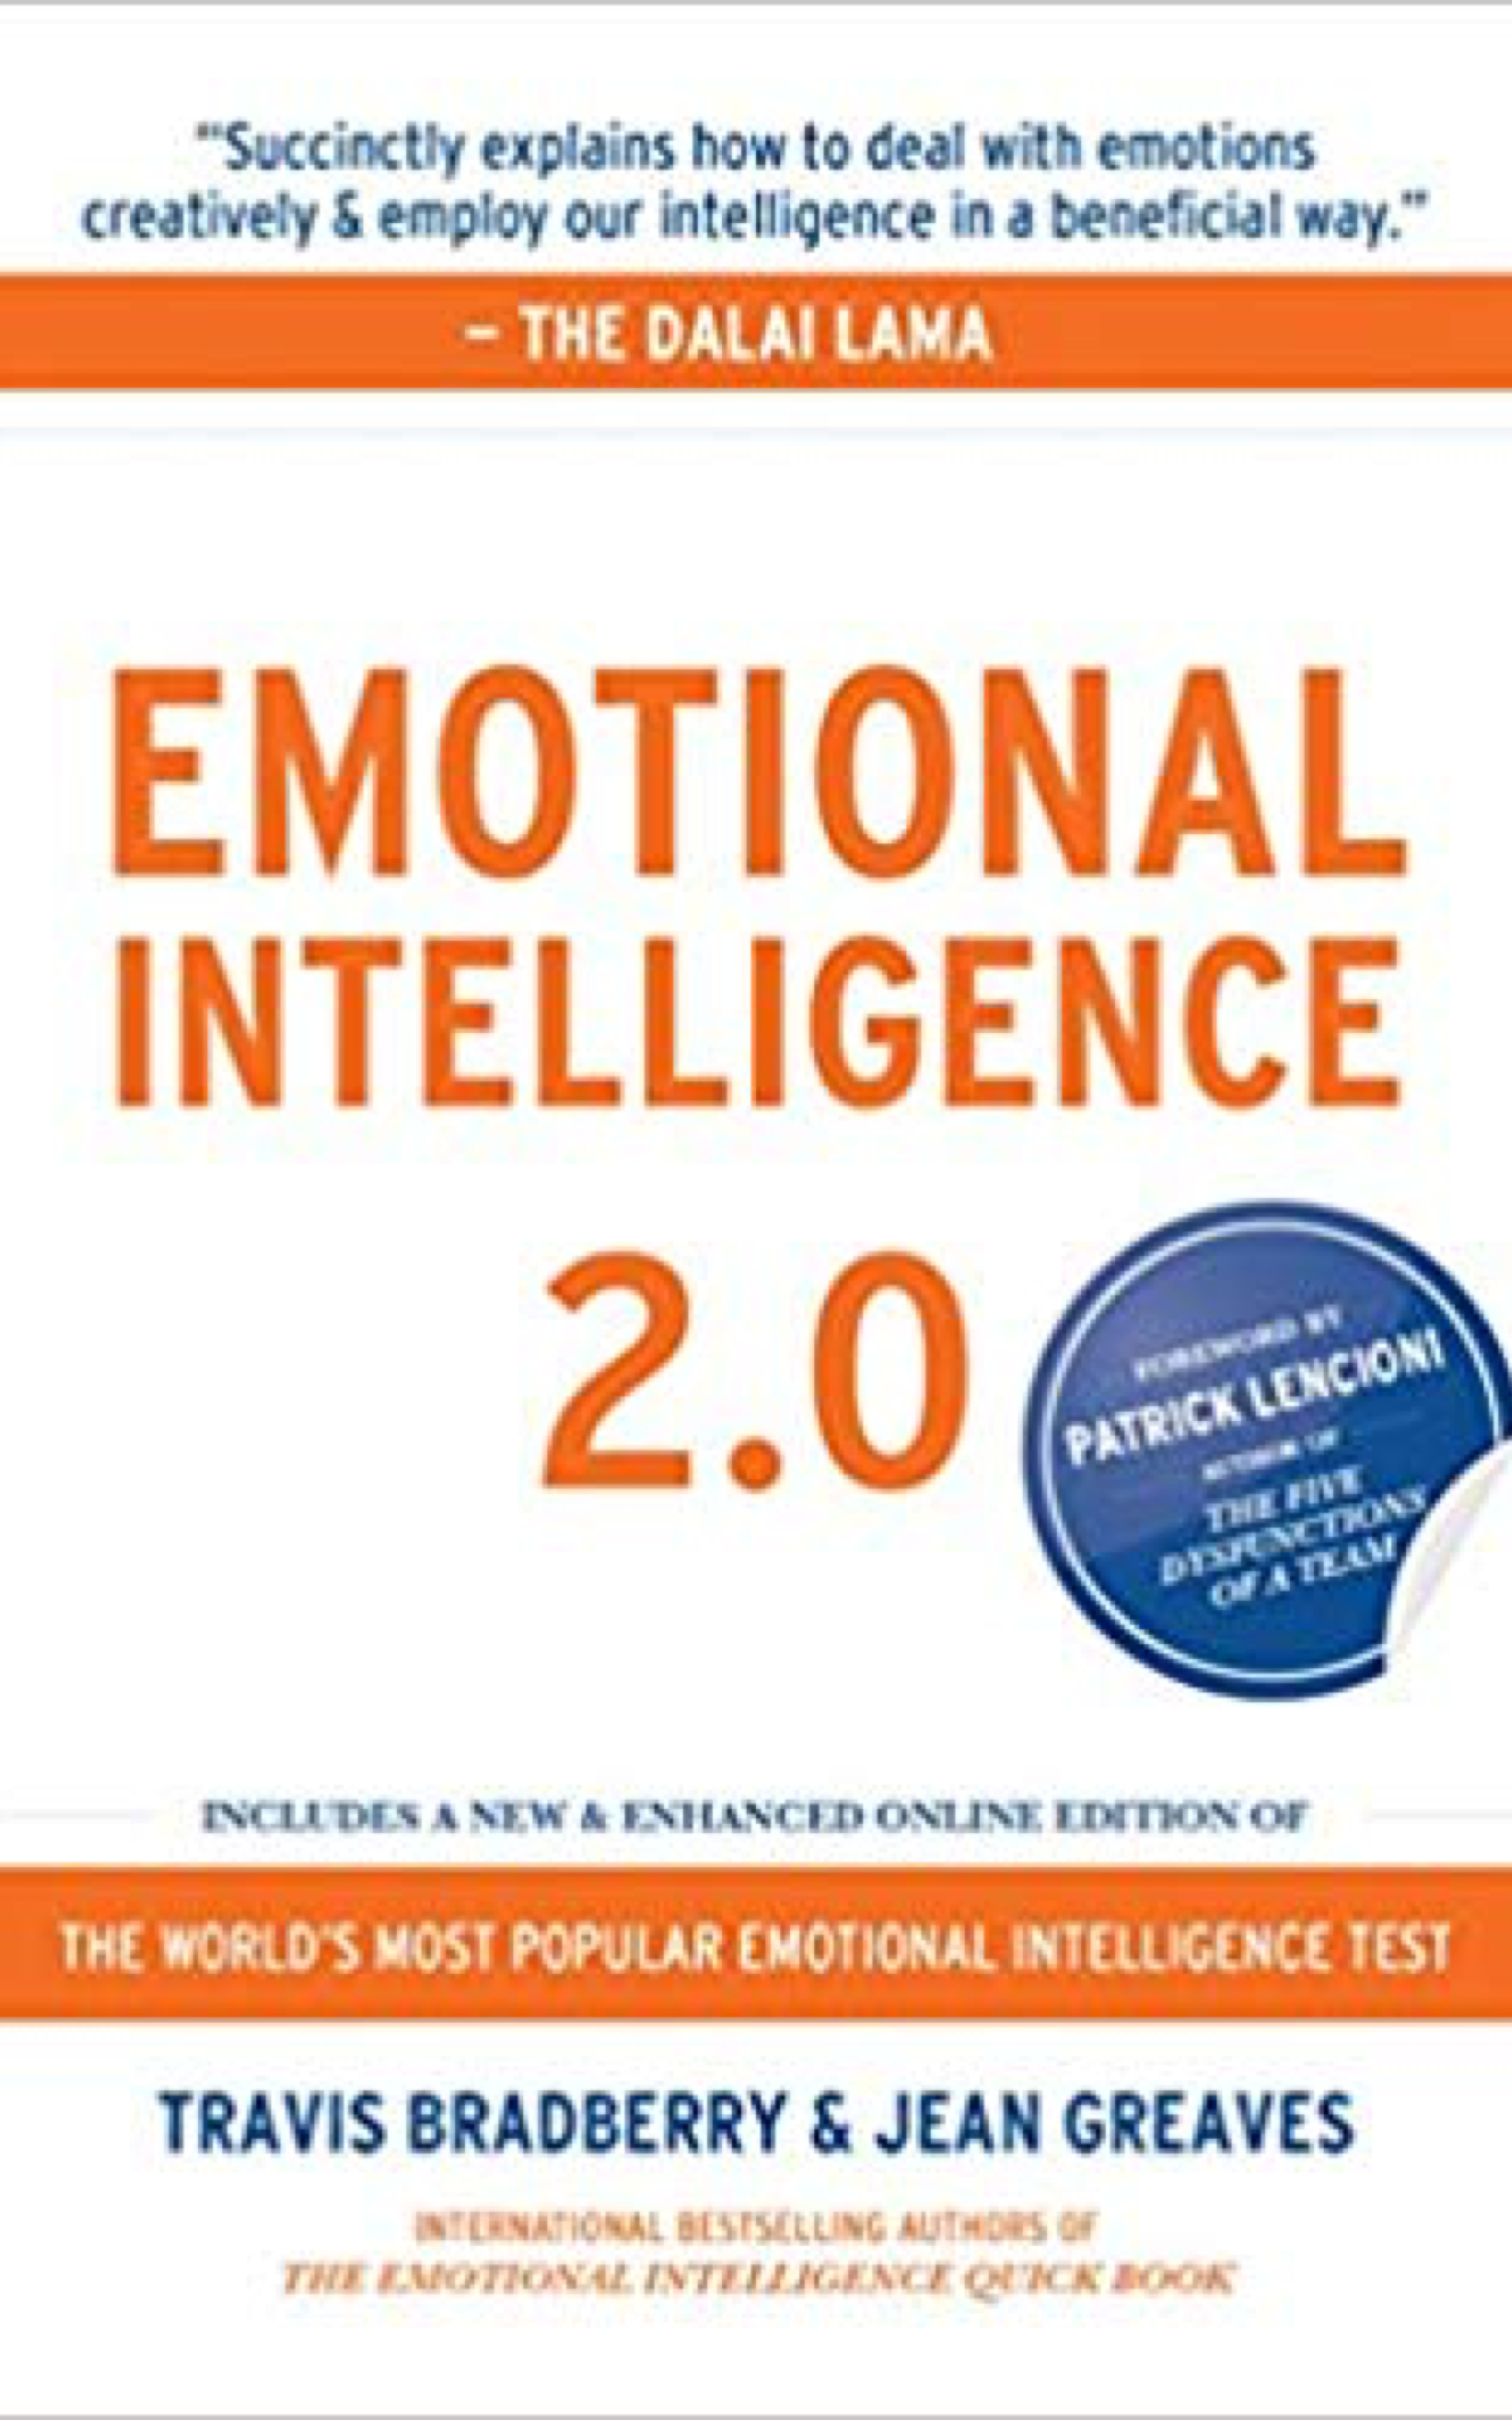 Emotional Intelligence 2.0 by Travis Bradberry & Jean Greaves